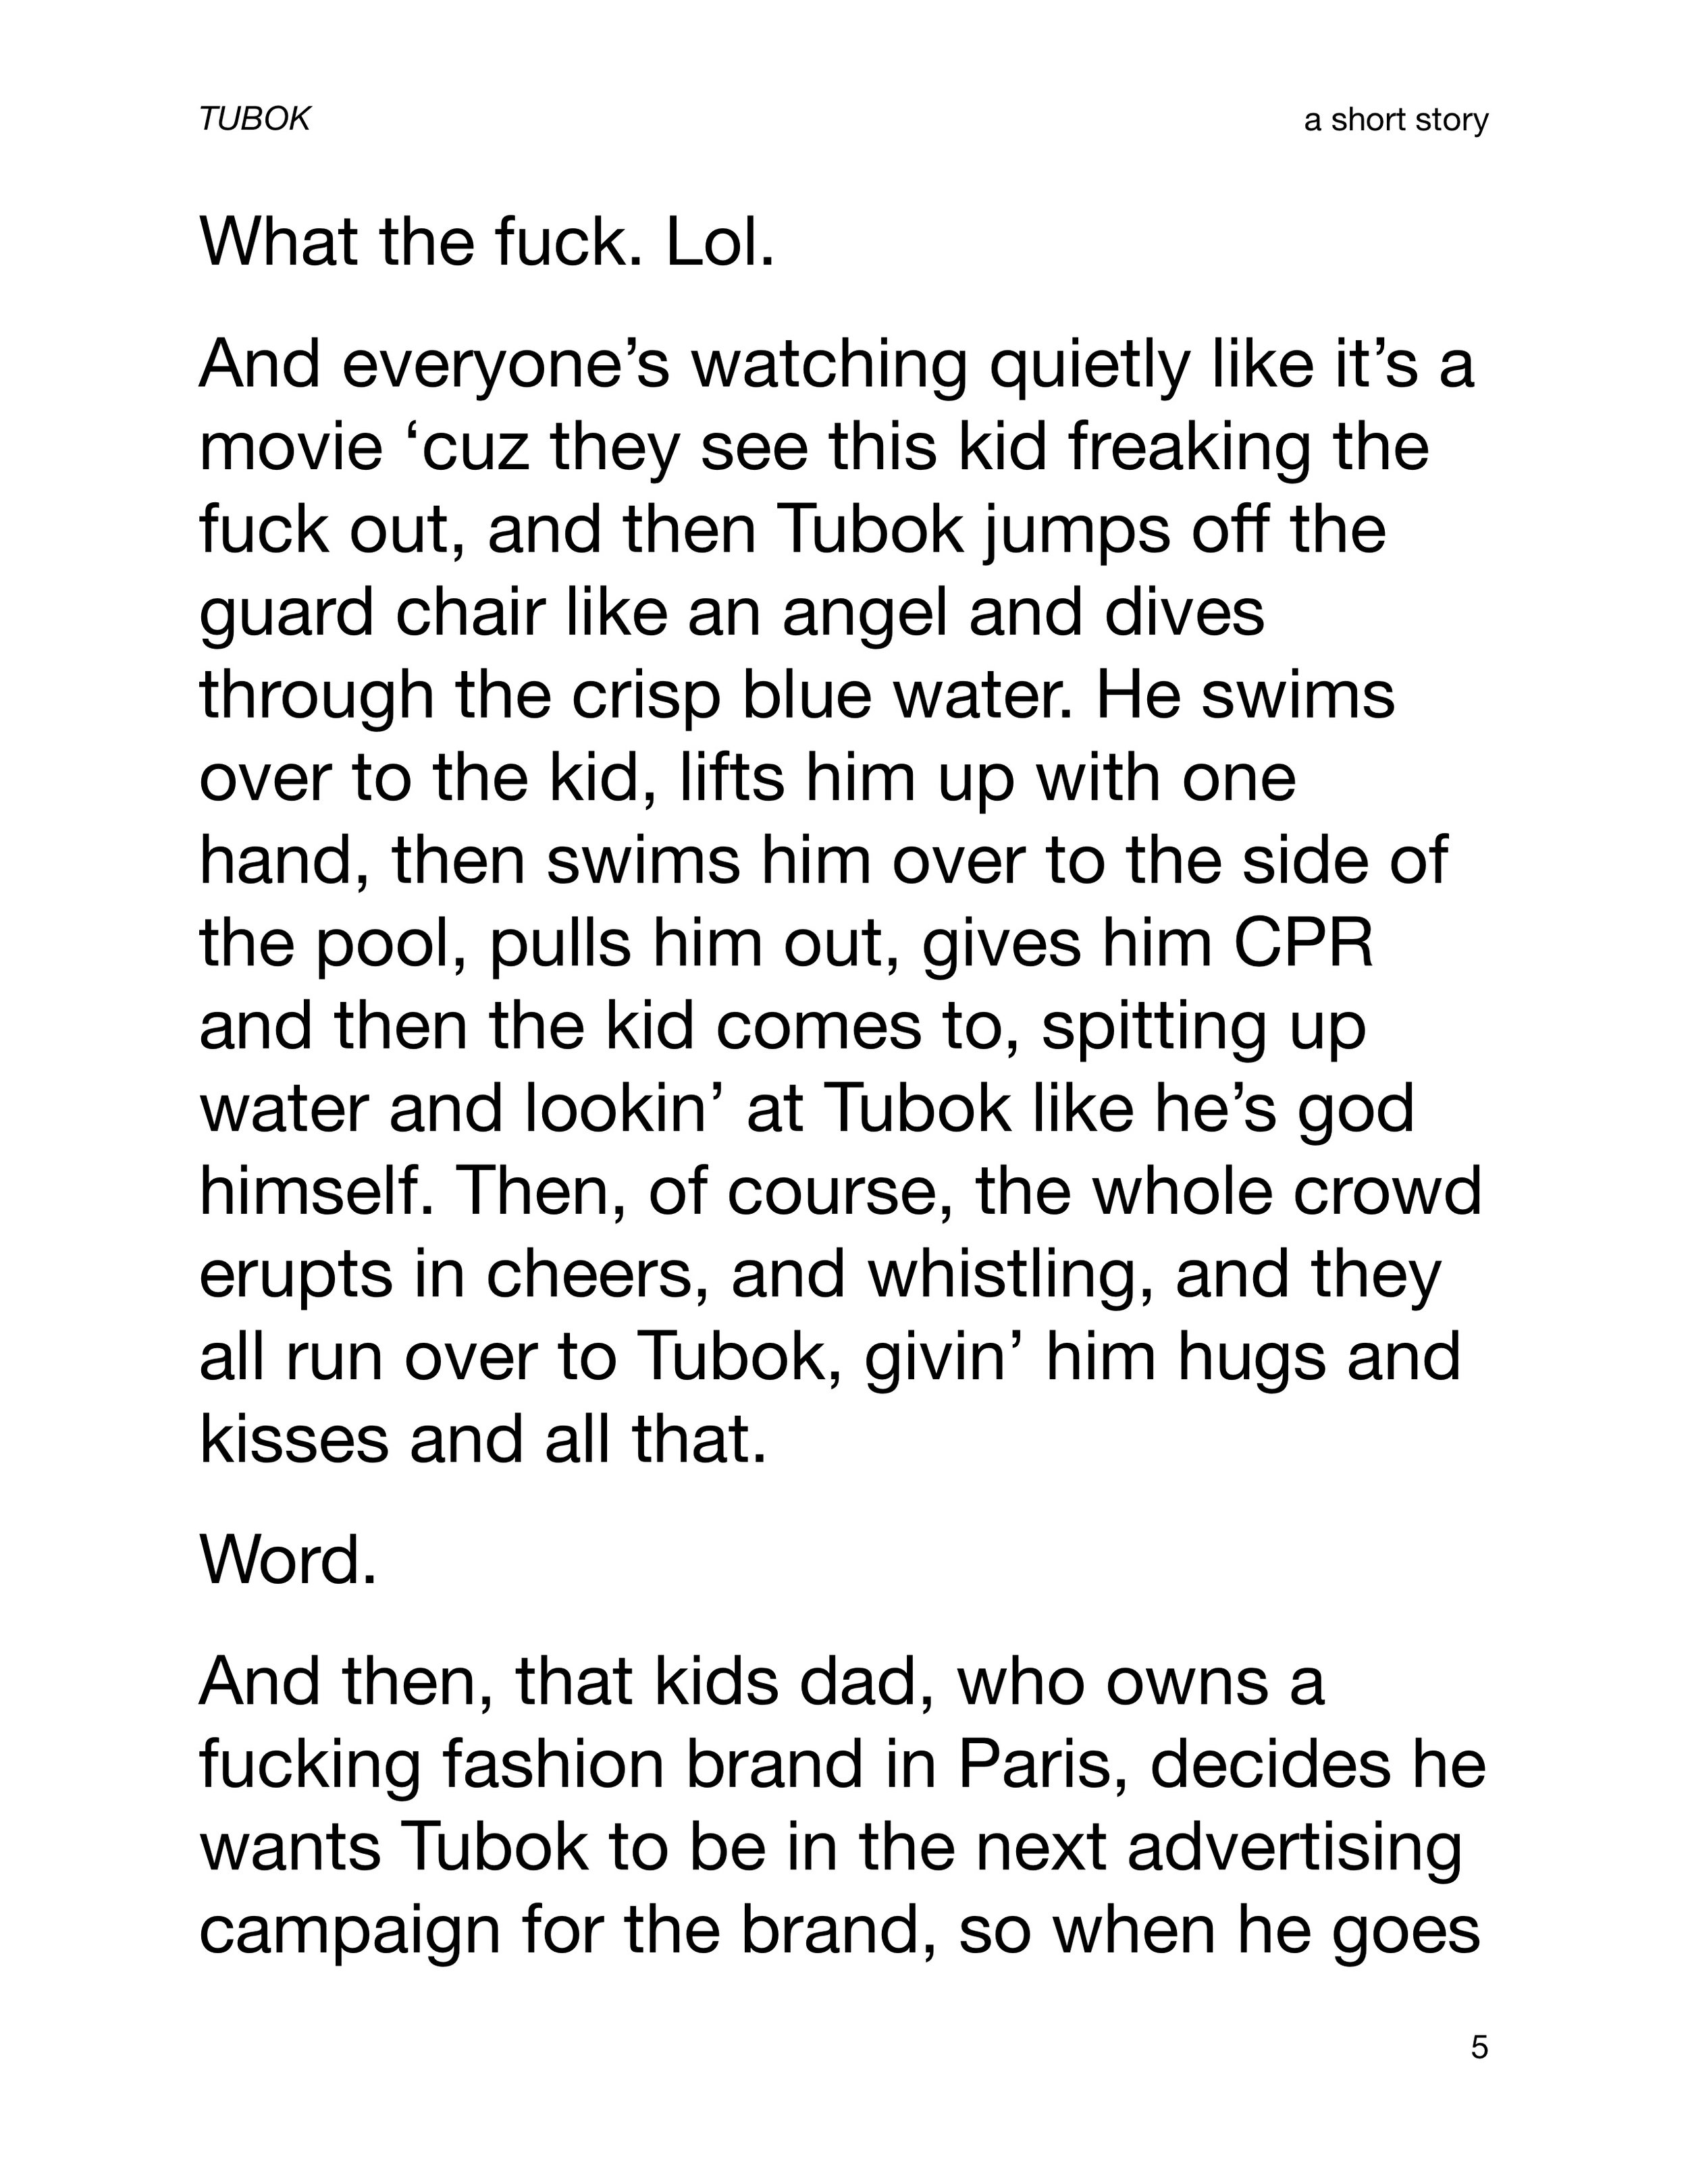 TUBOK (A Short Story) 5.jpg